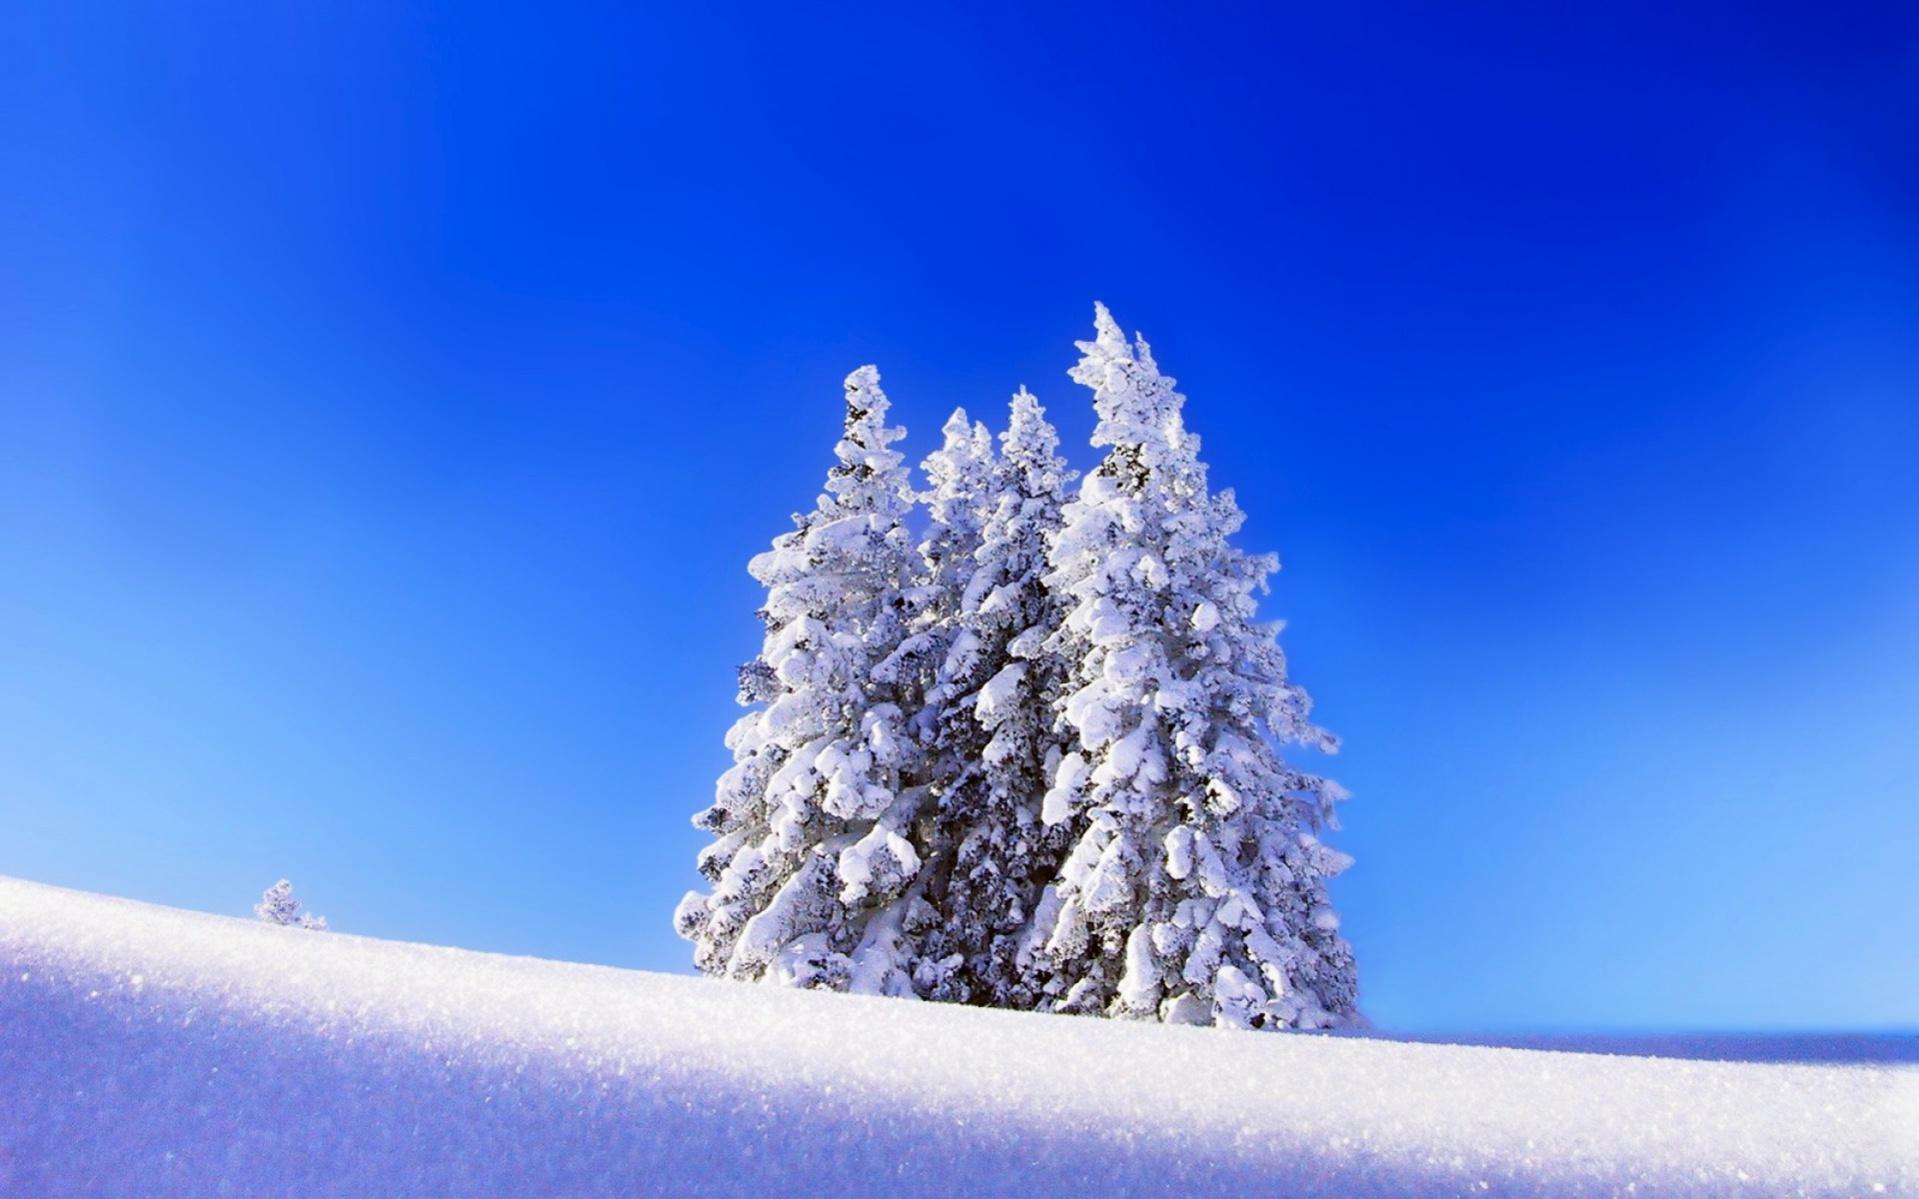 Free Winter Wallpaper